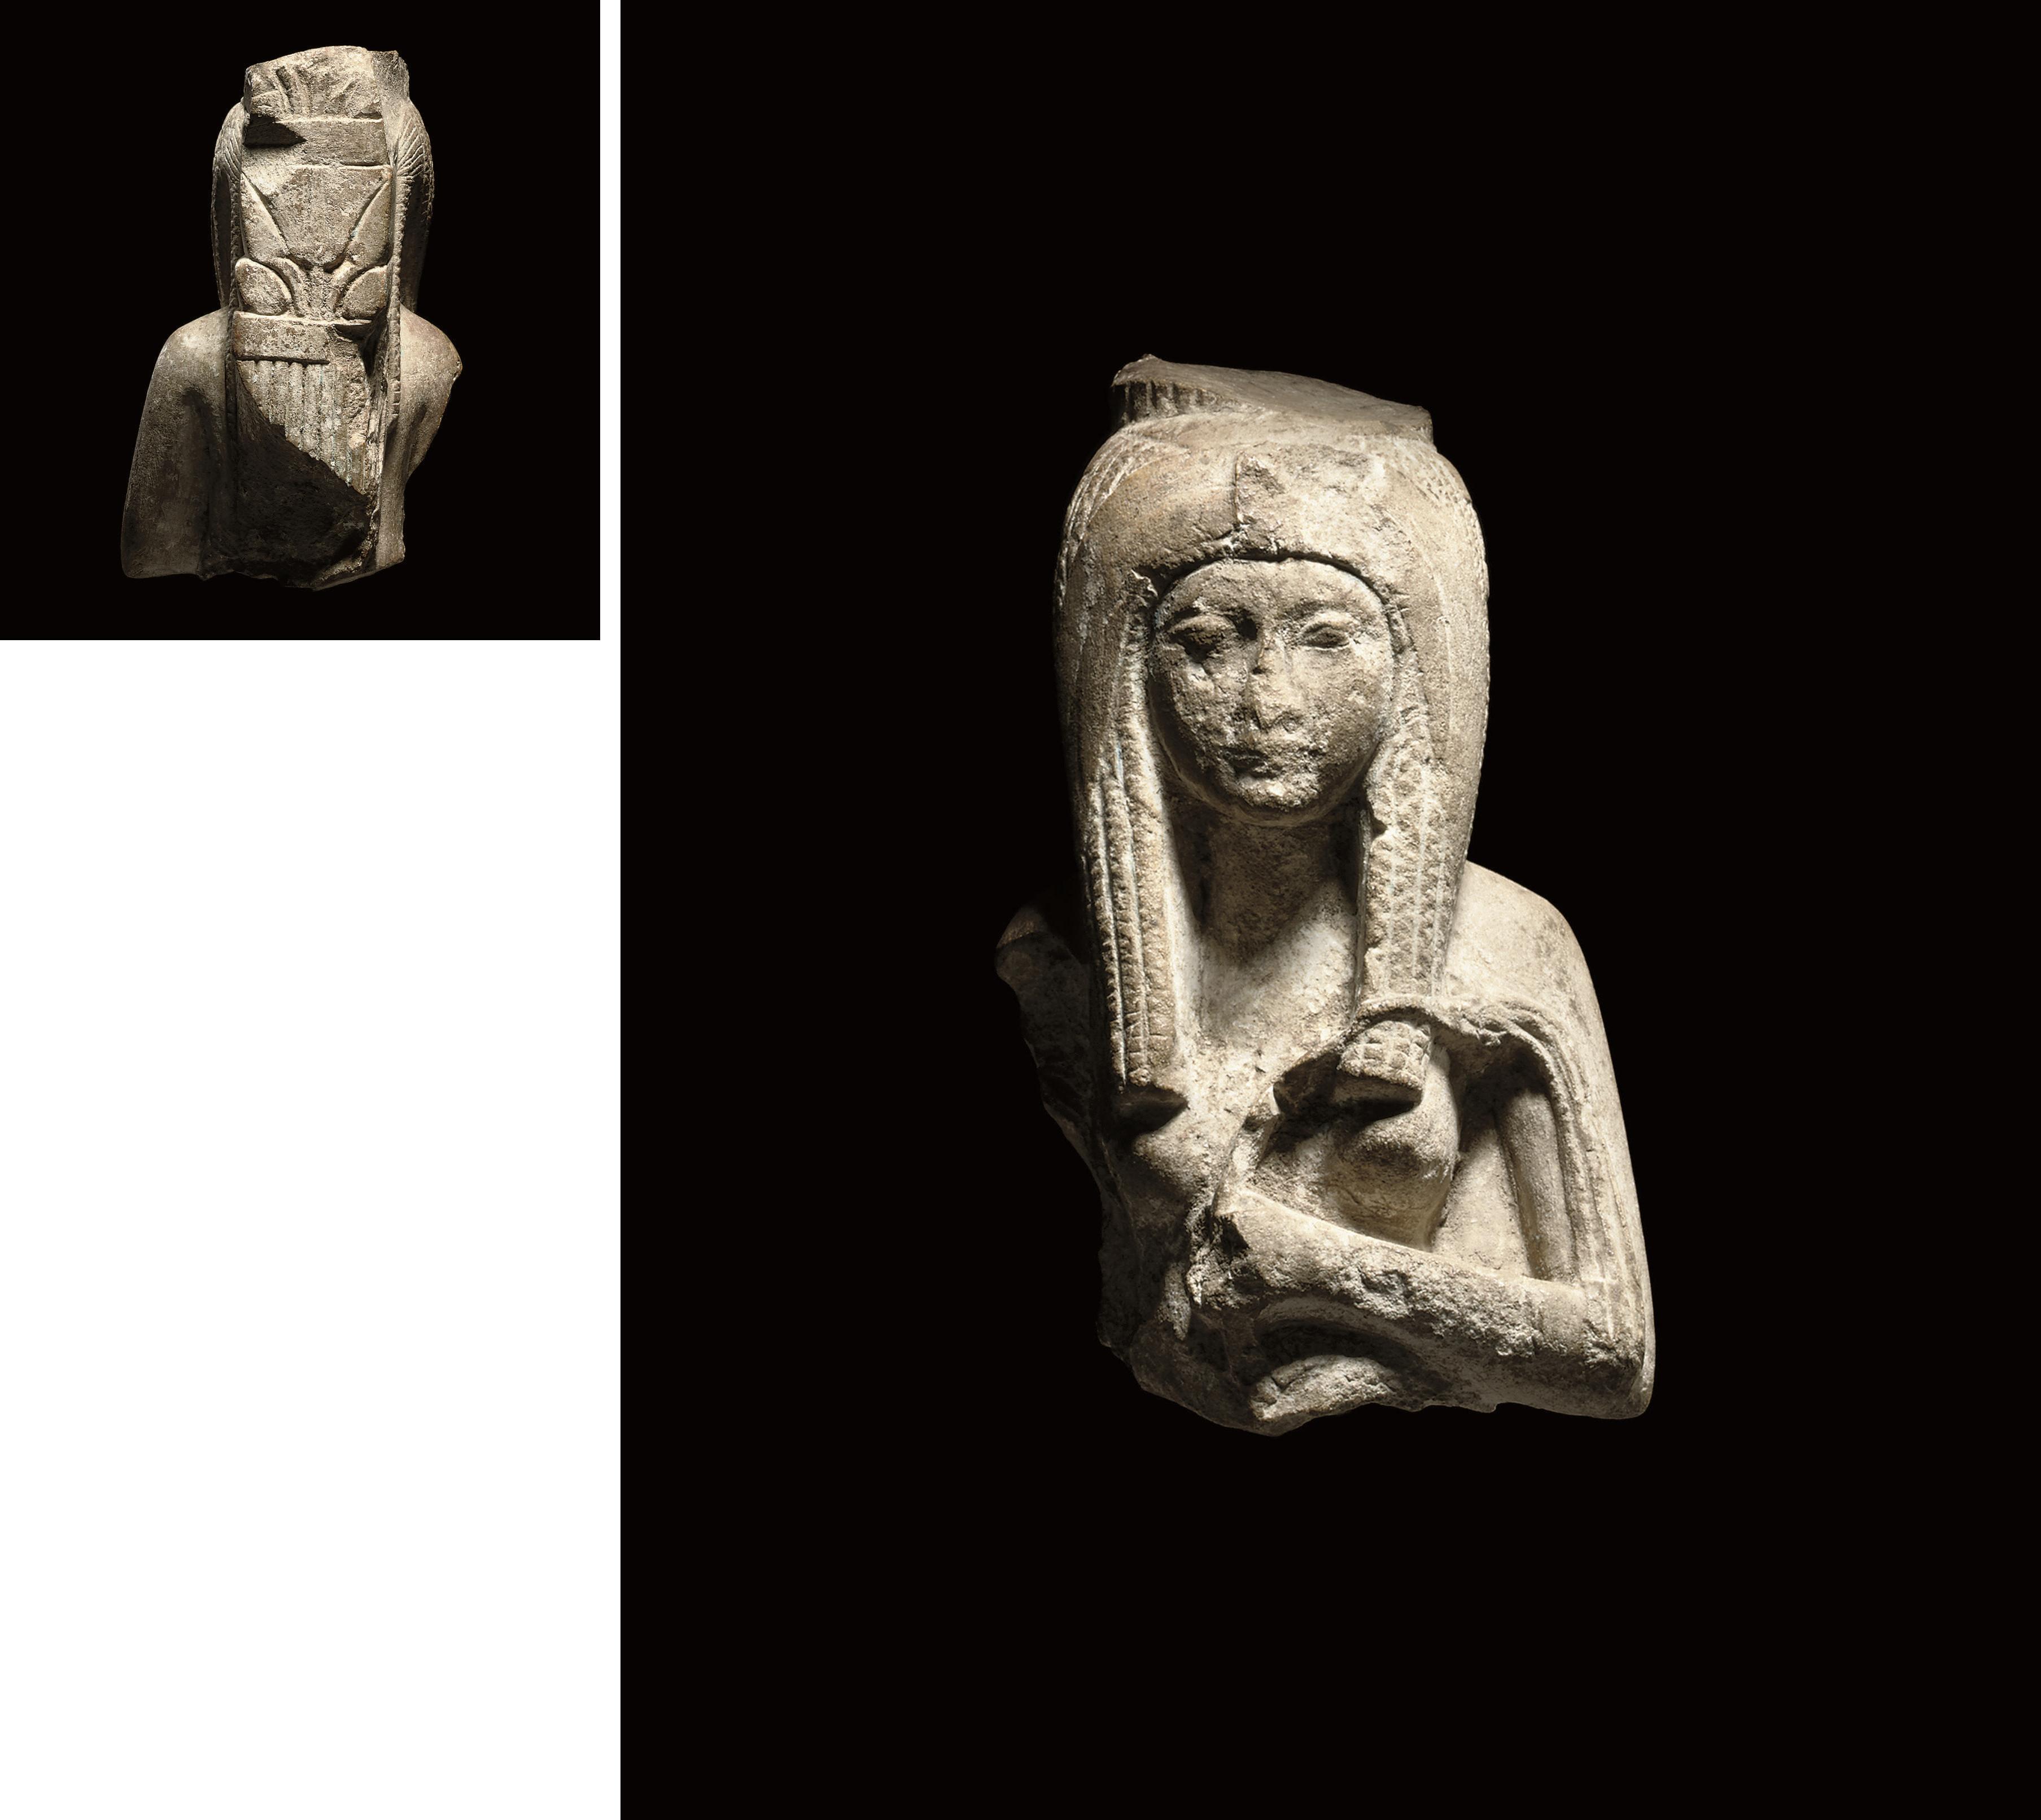 AN EGYPTIAN LIMESTONE BUST OF